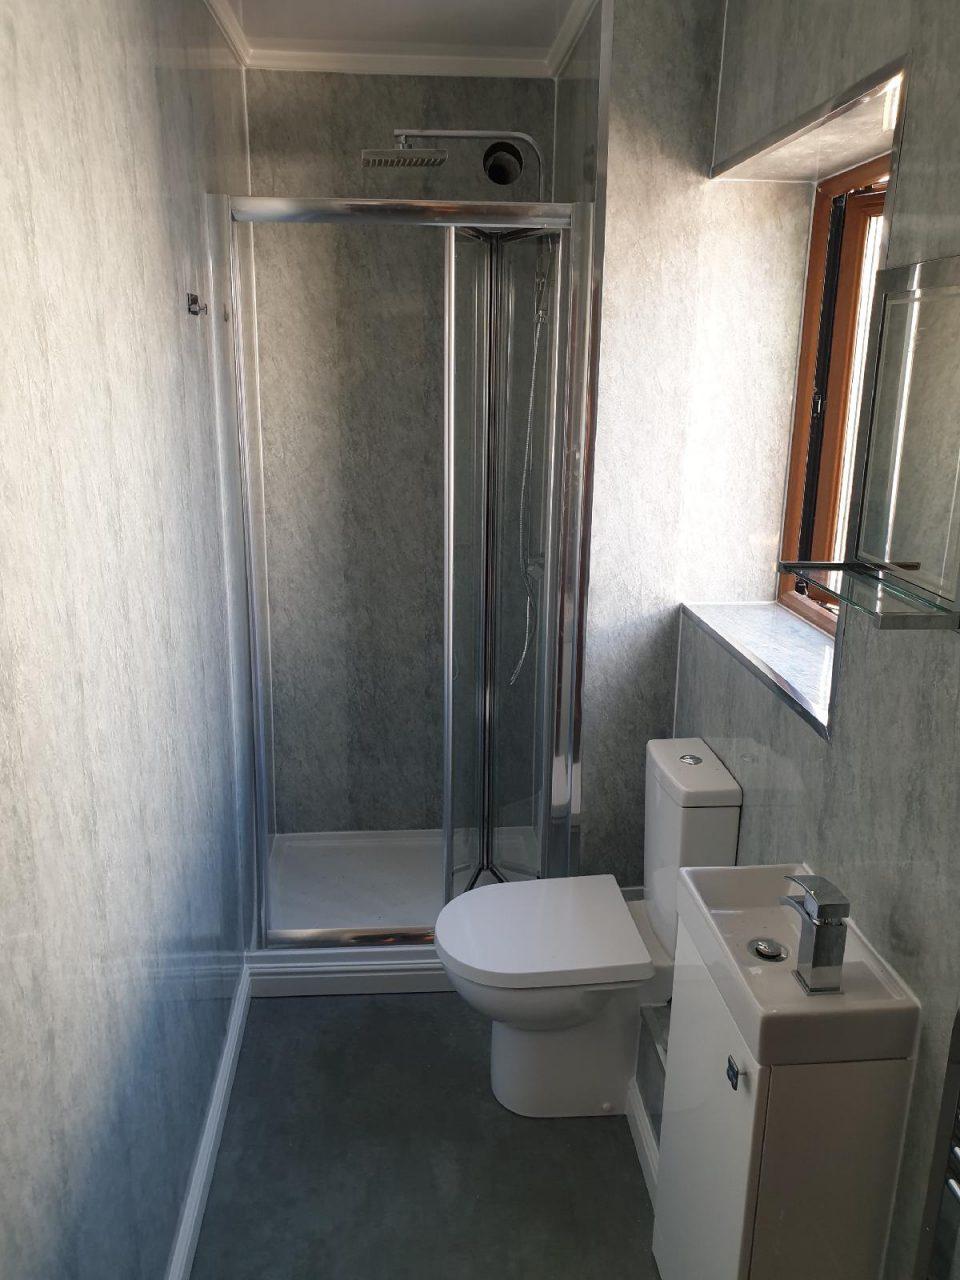 New Bathroom Mrs Wootton in Birmingham Guest Cloakroom